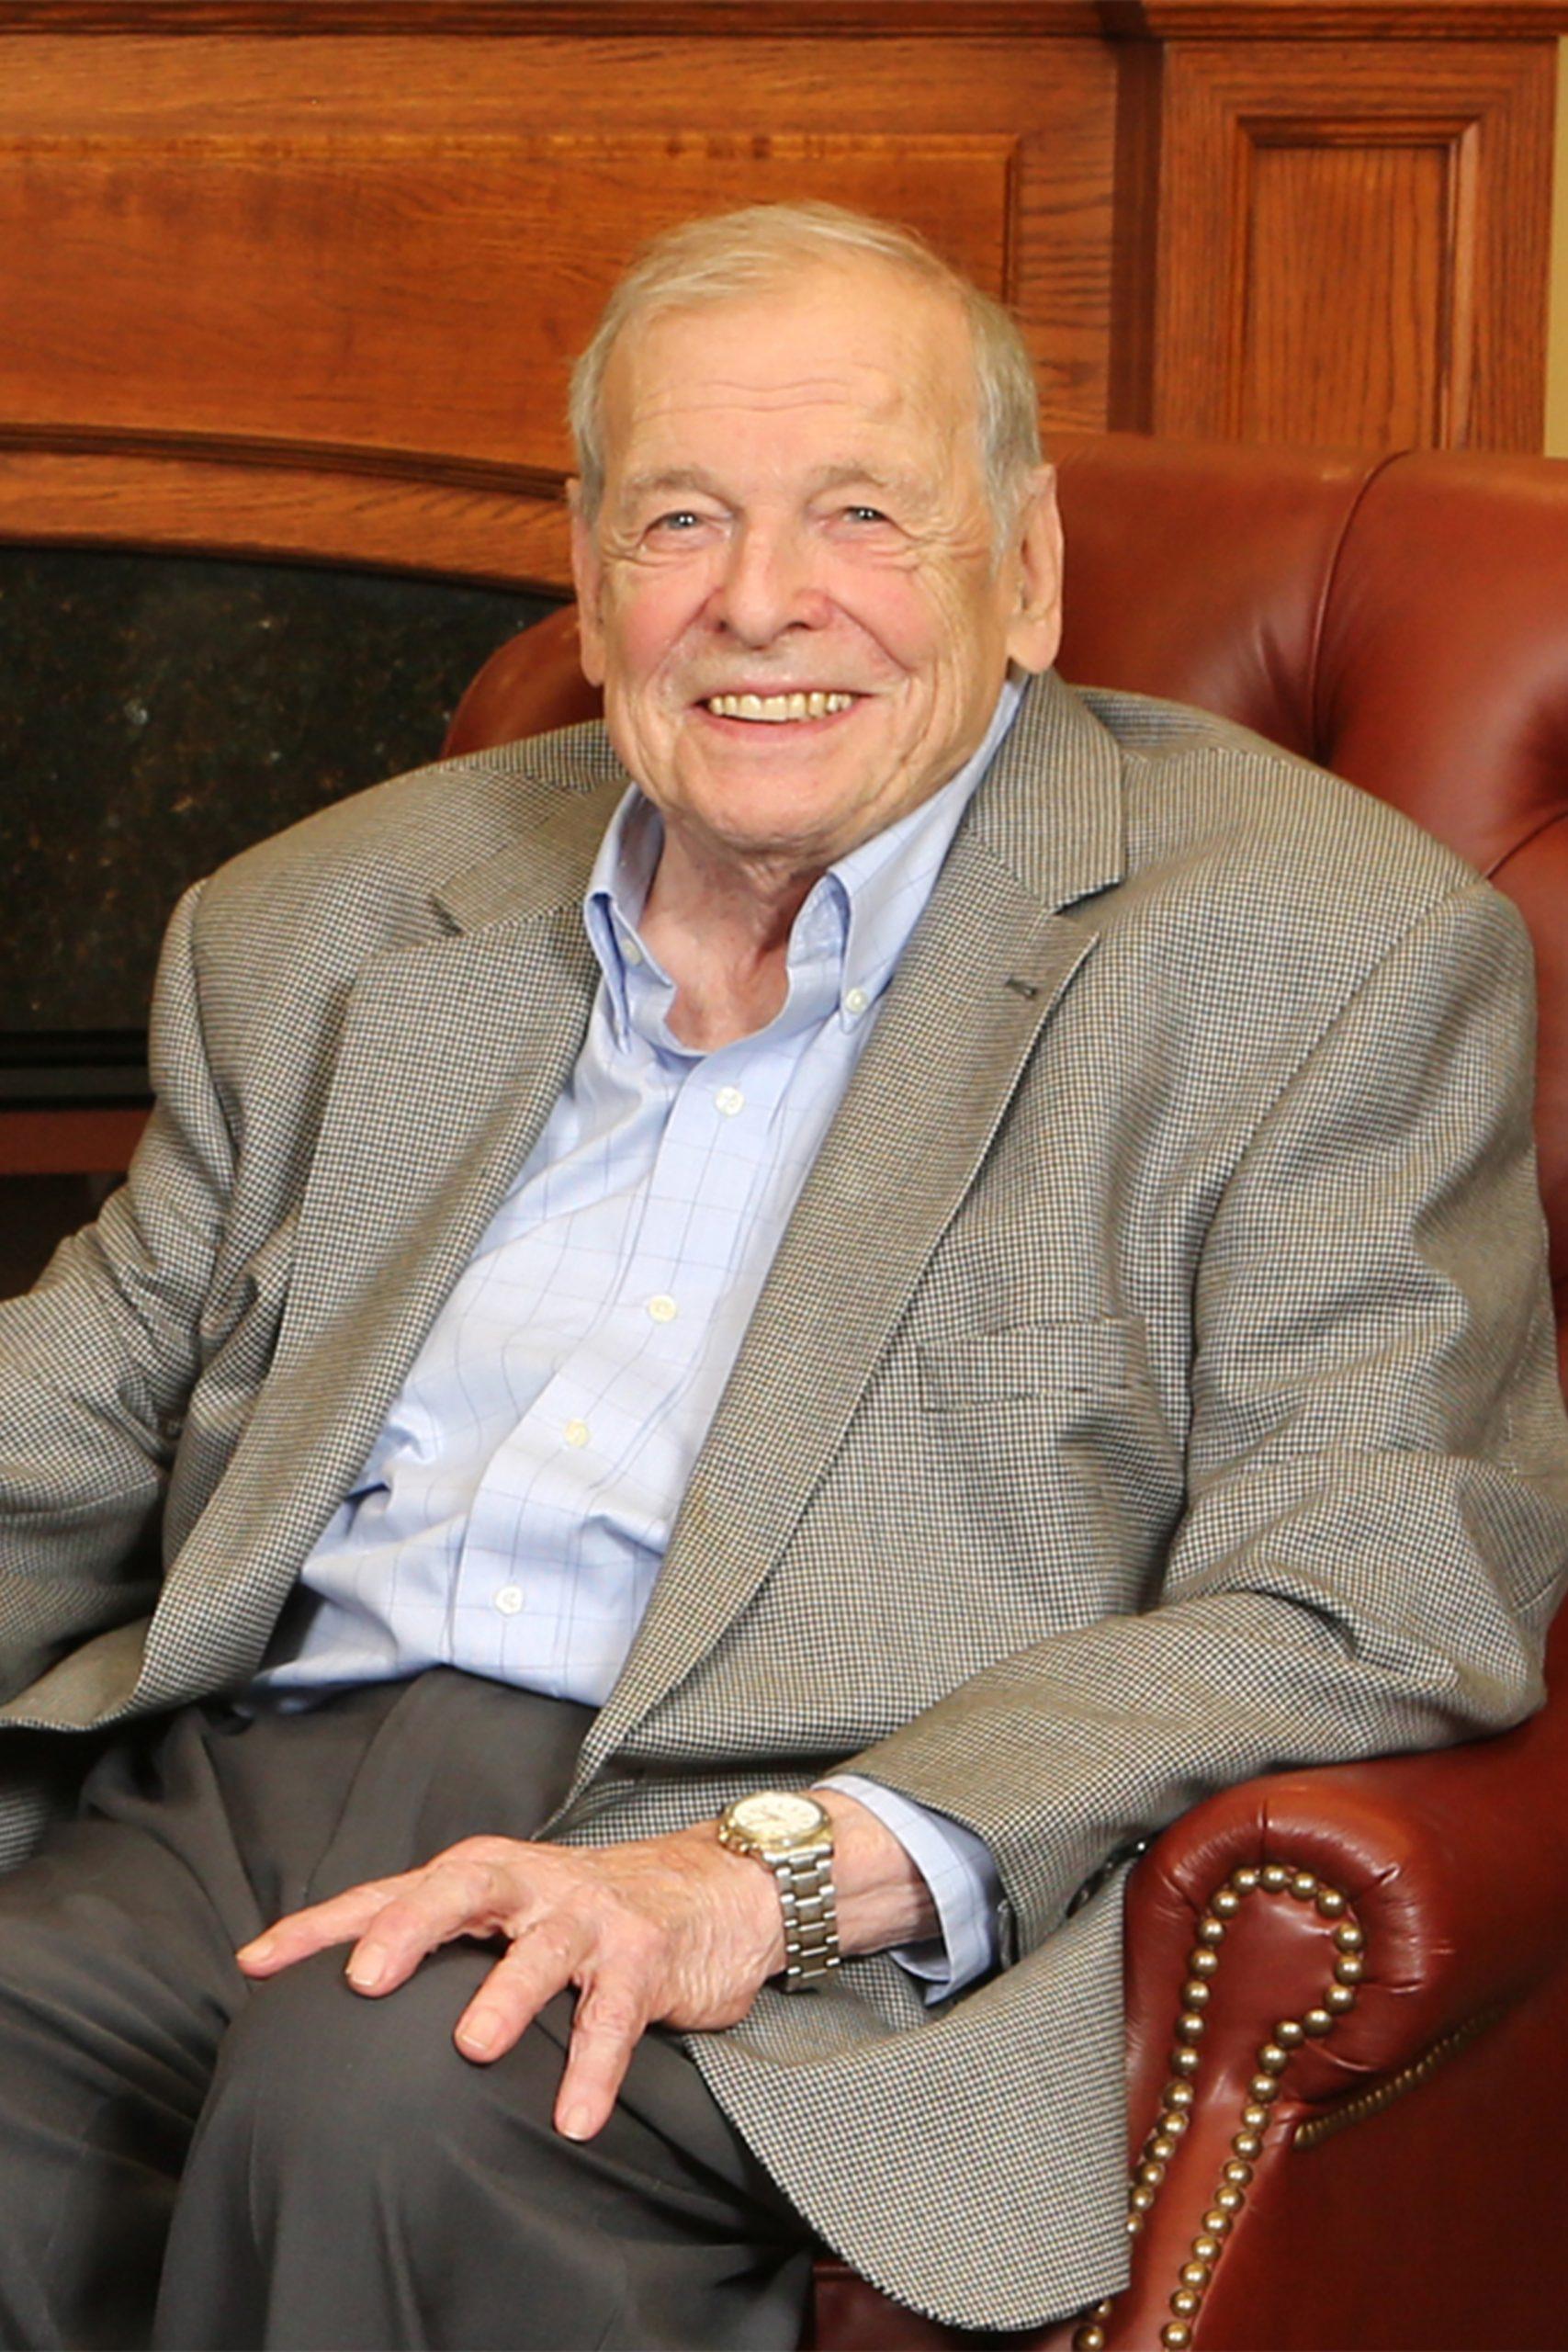 Peter Braunfeld